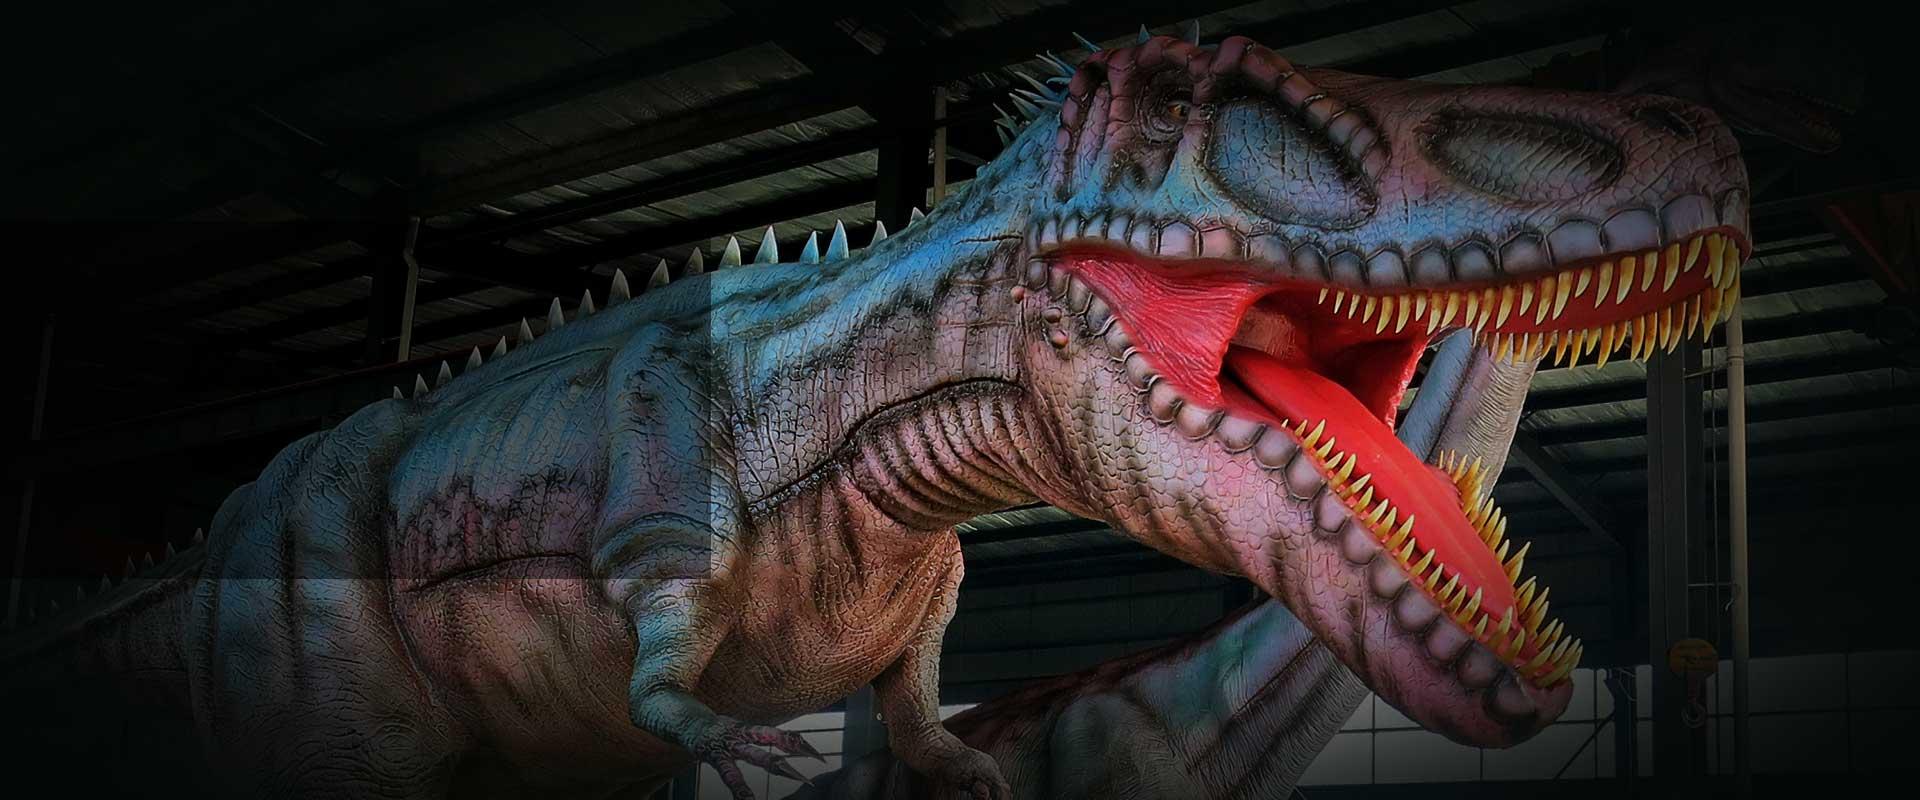 animatronic dinosaur